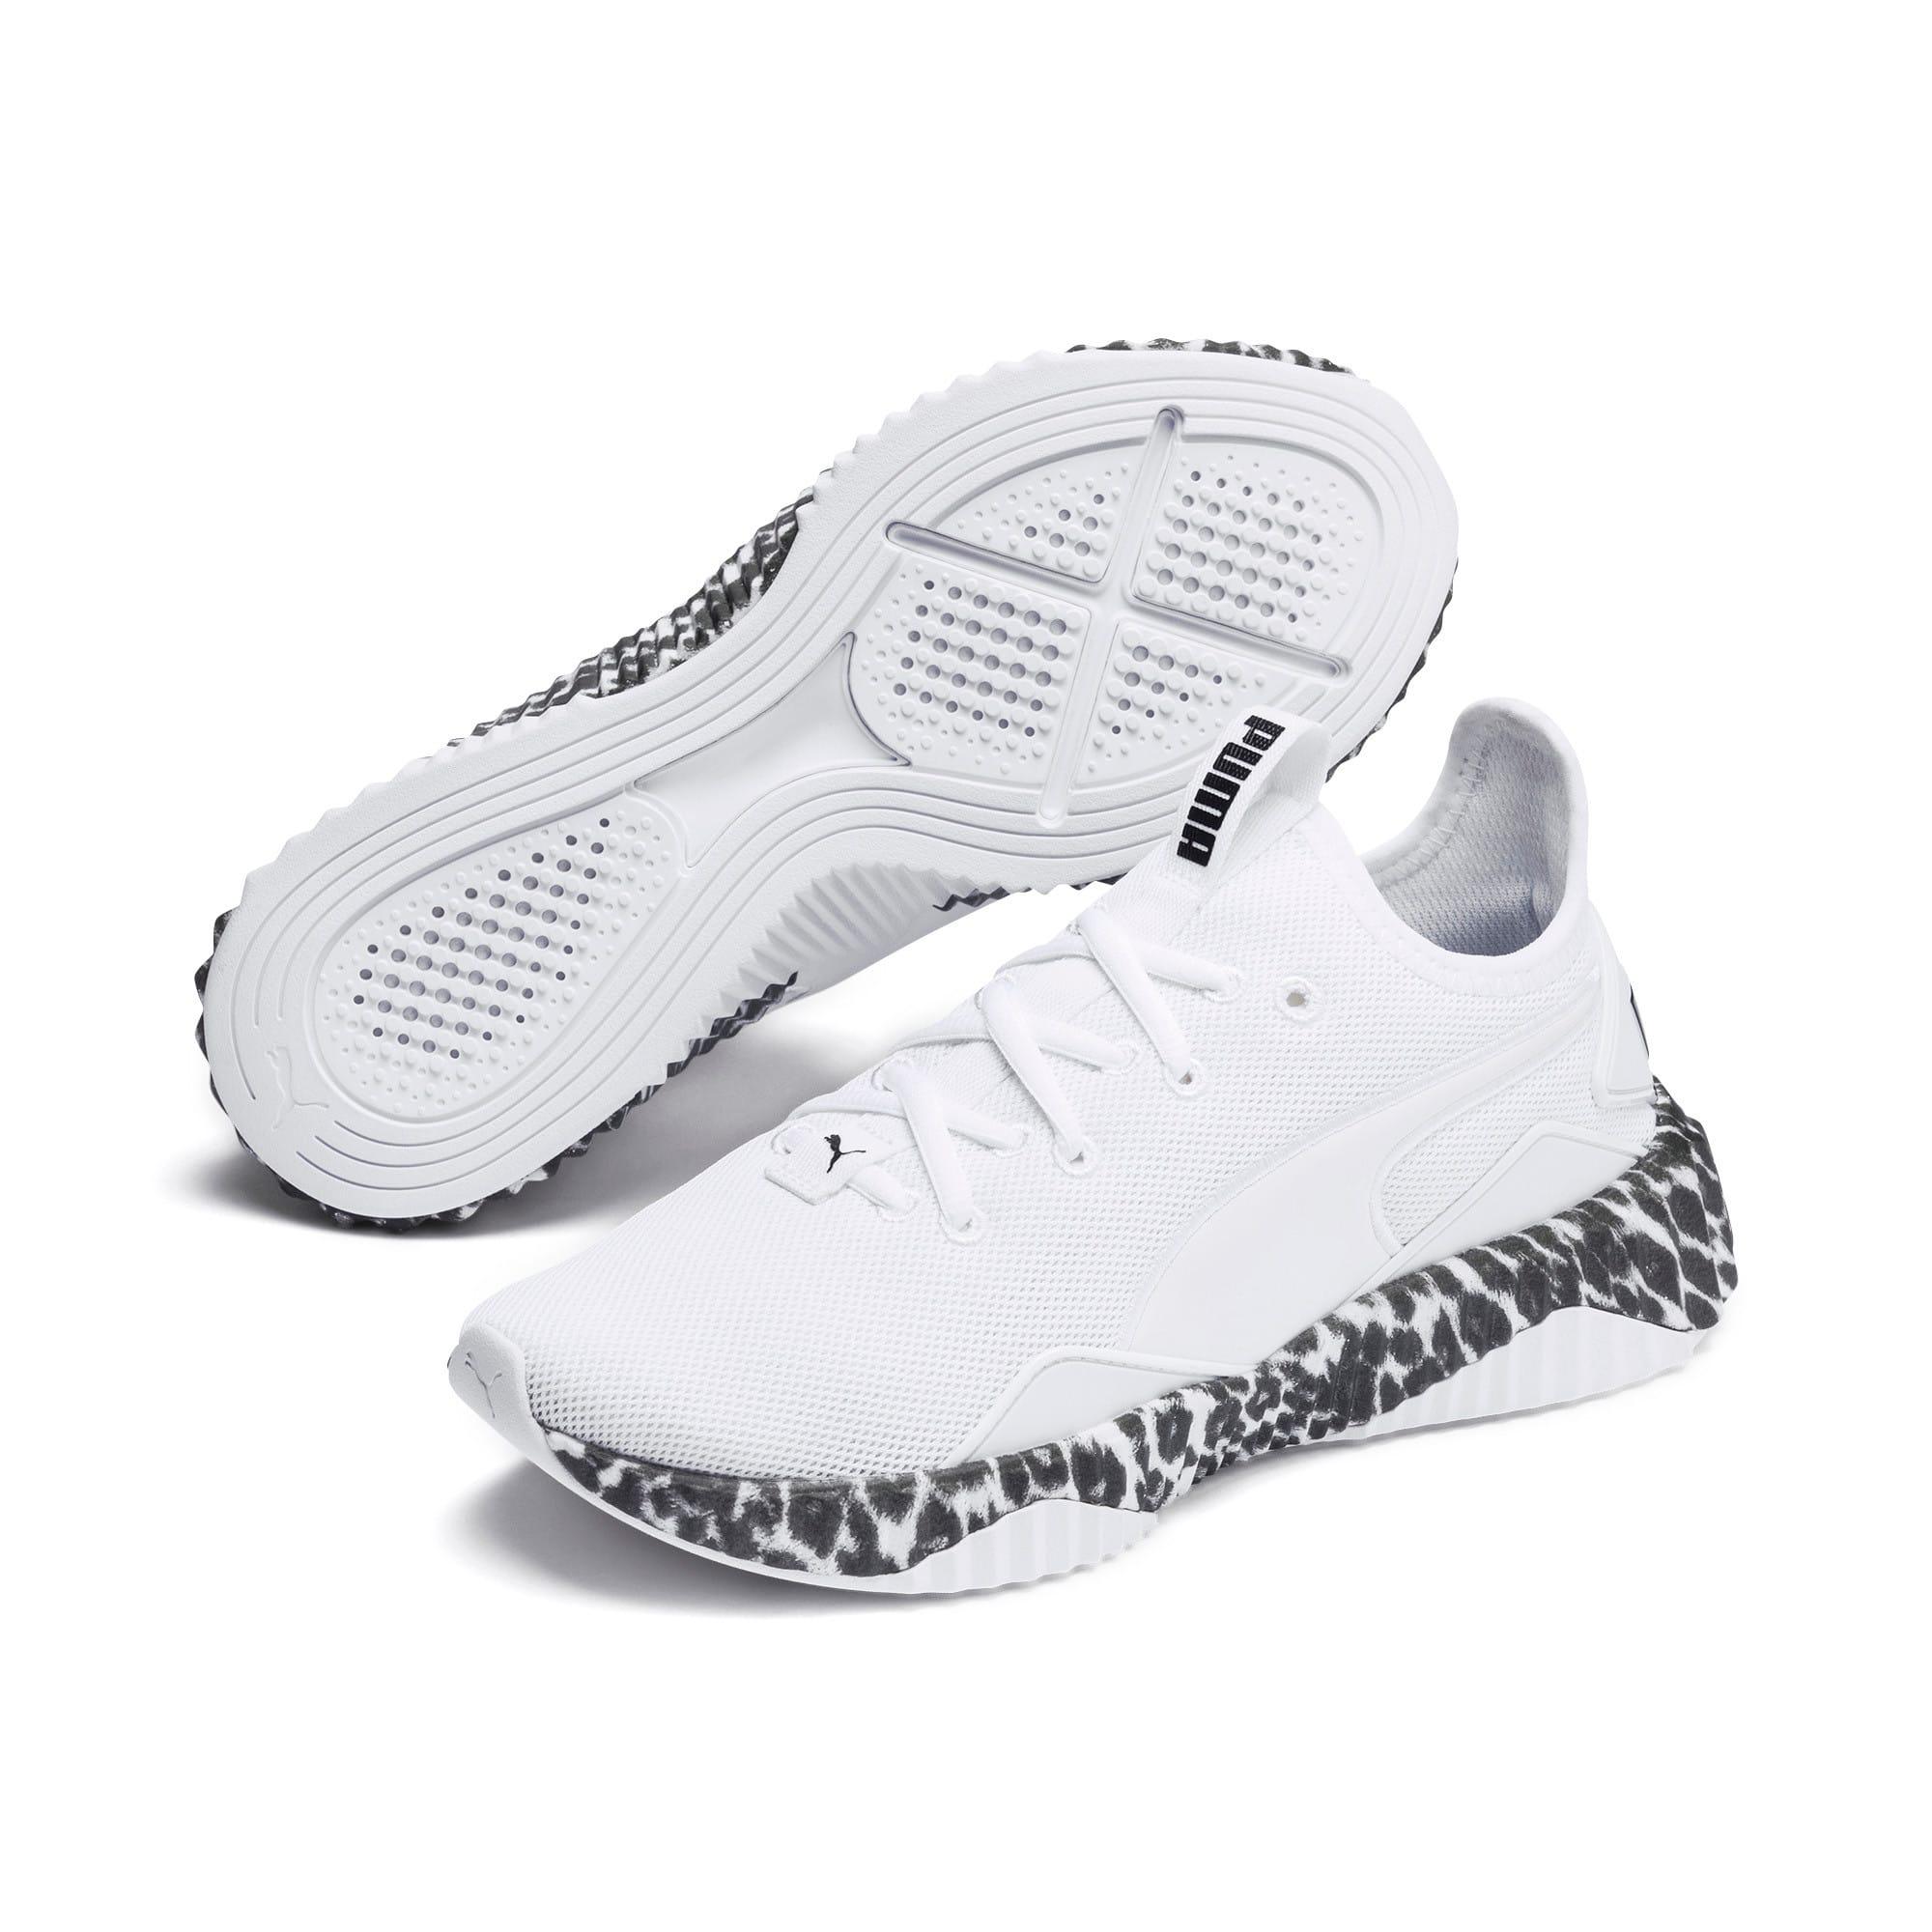 Thumbnail 3 of Defy Leopard Women's Sneakers, Puma White-Puma Black, medium